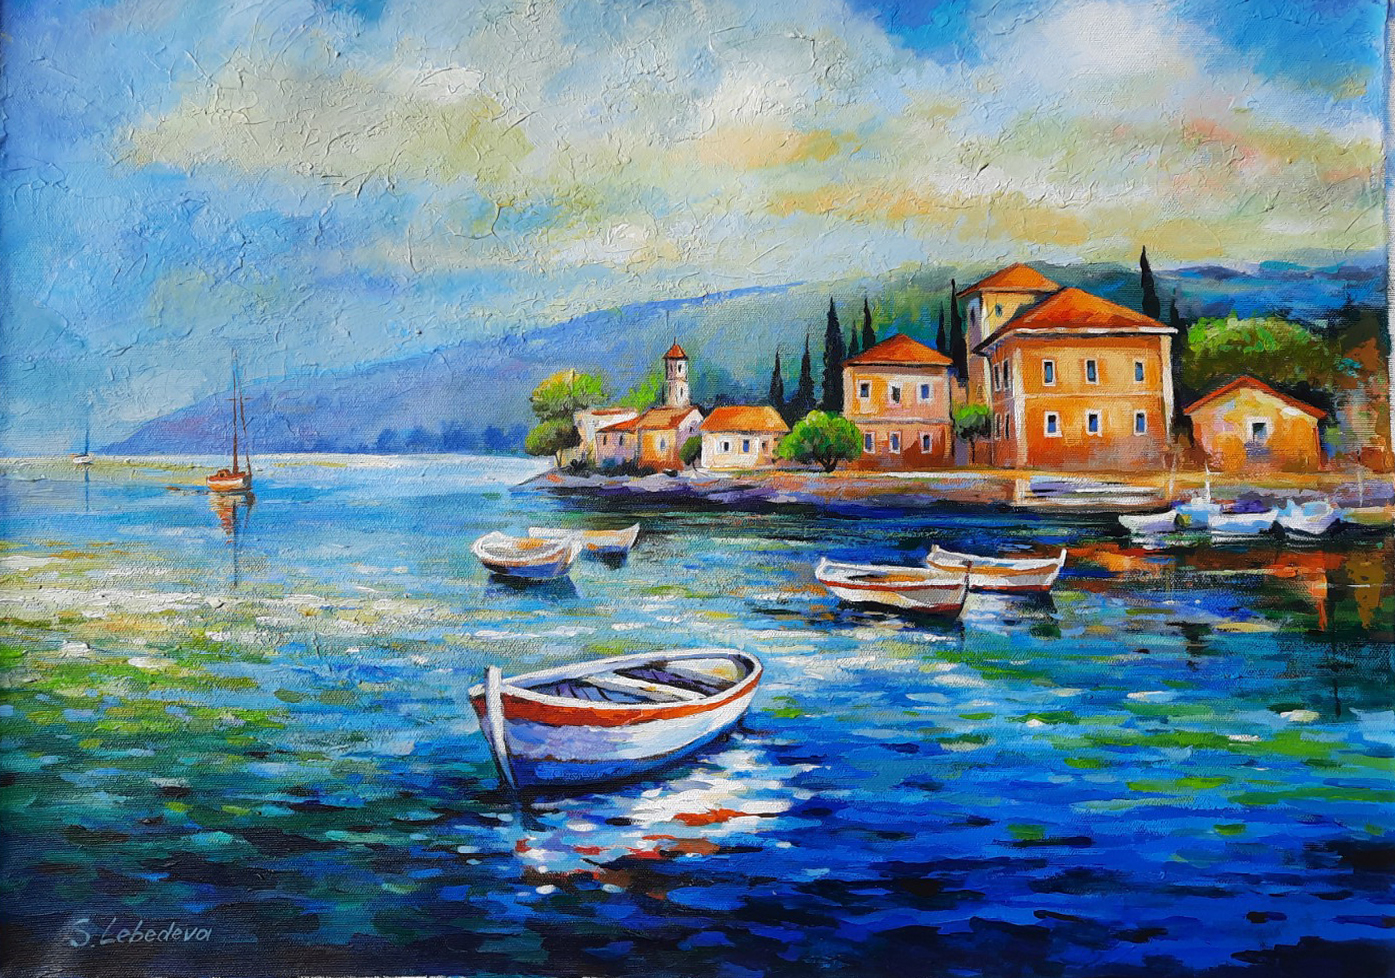 Tiberias Boats by  Lebedeva